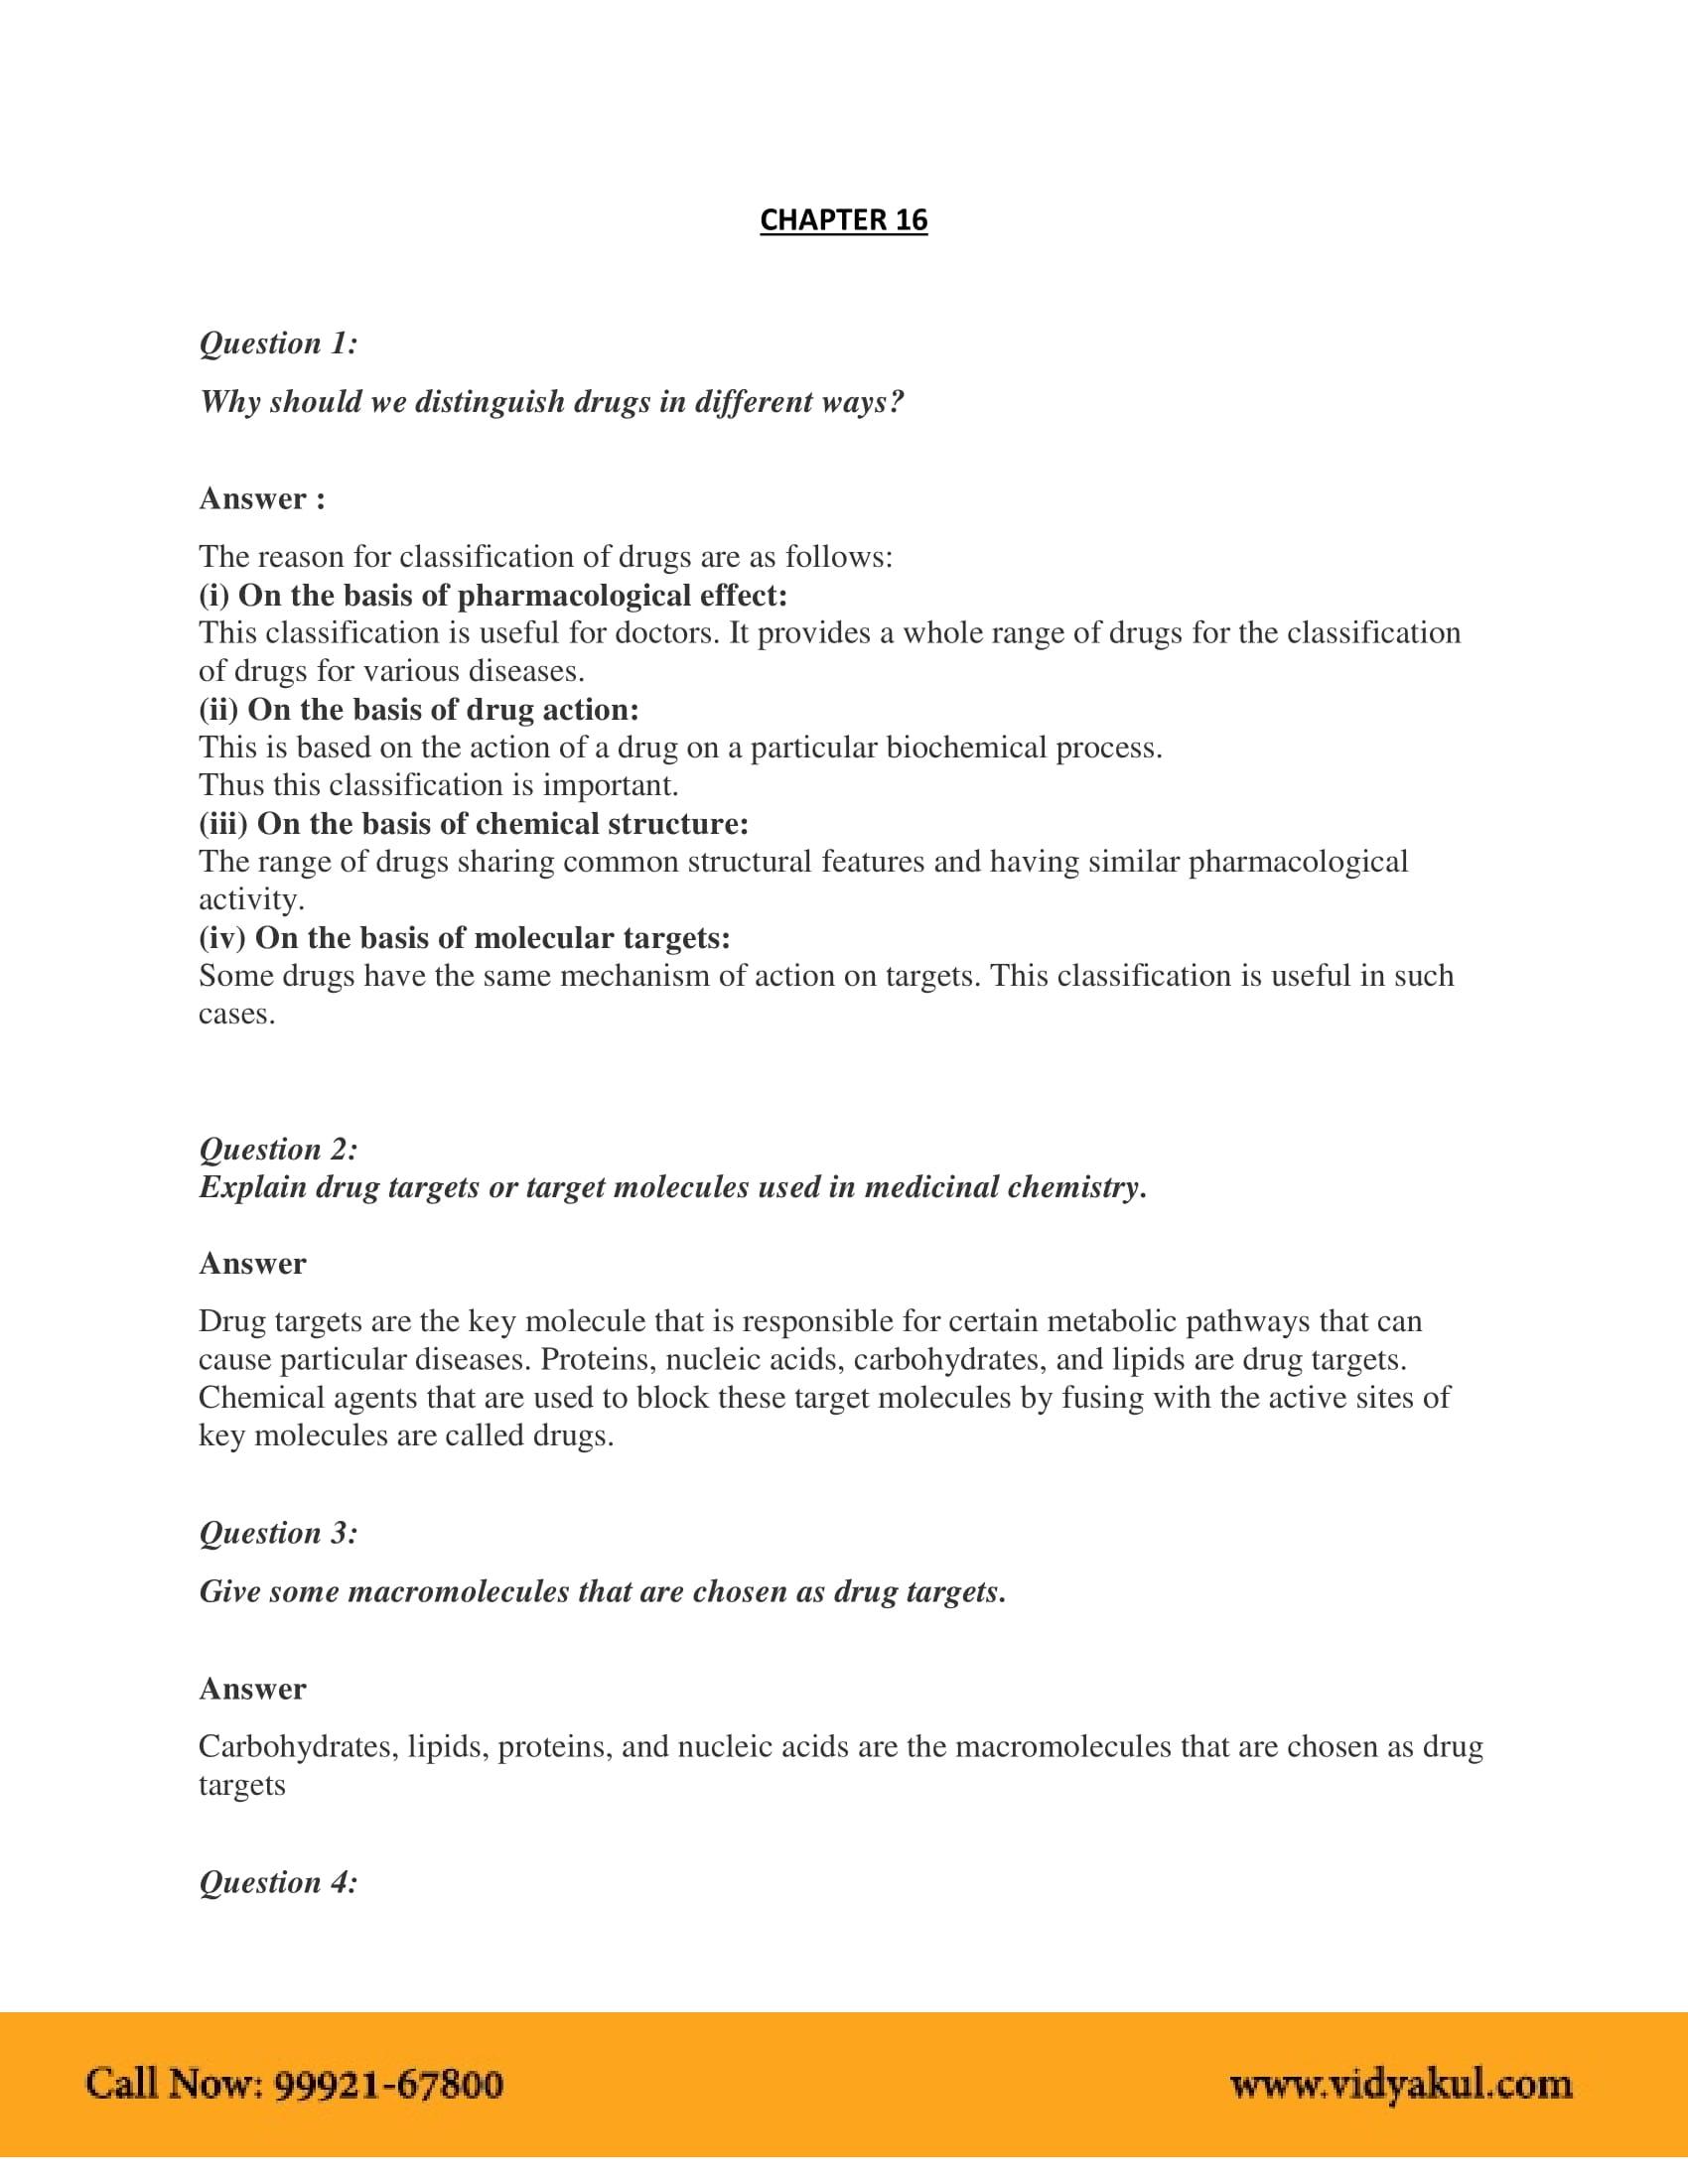 NCERT Solution Class 12 Chemistry Chapter 16 | Vidyakul